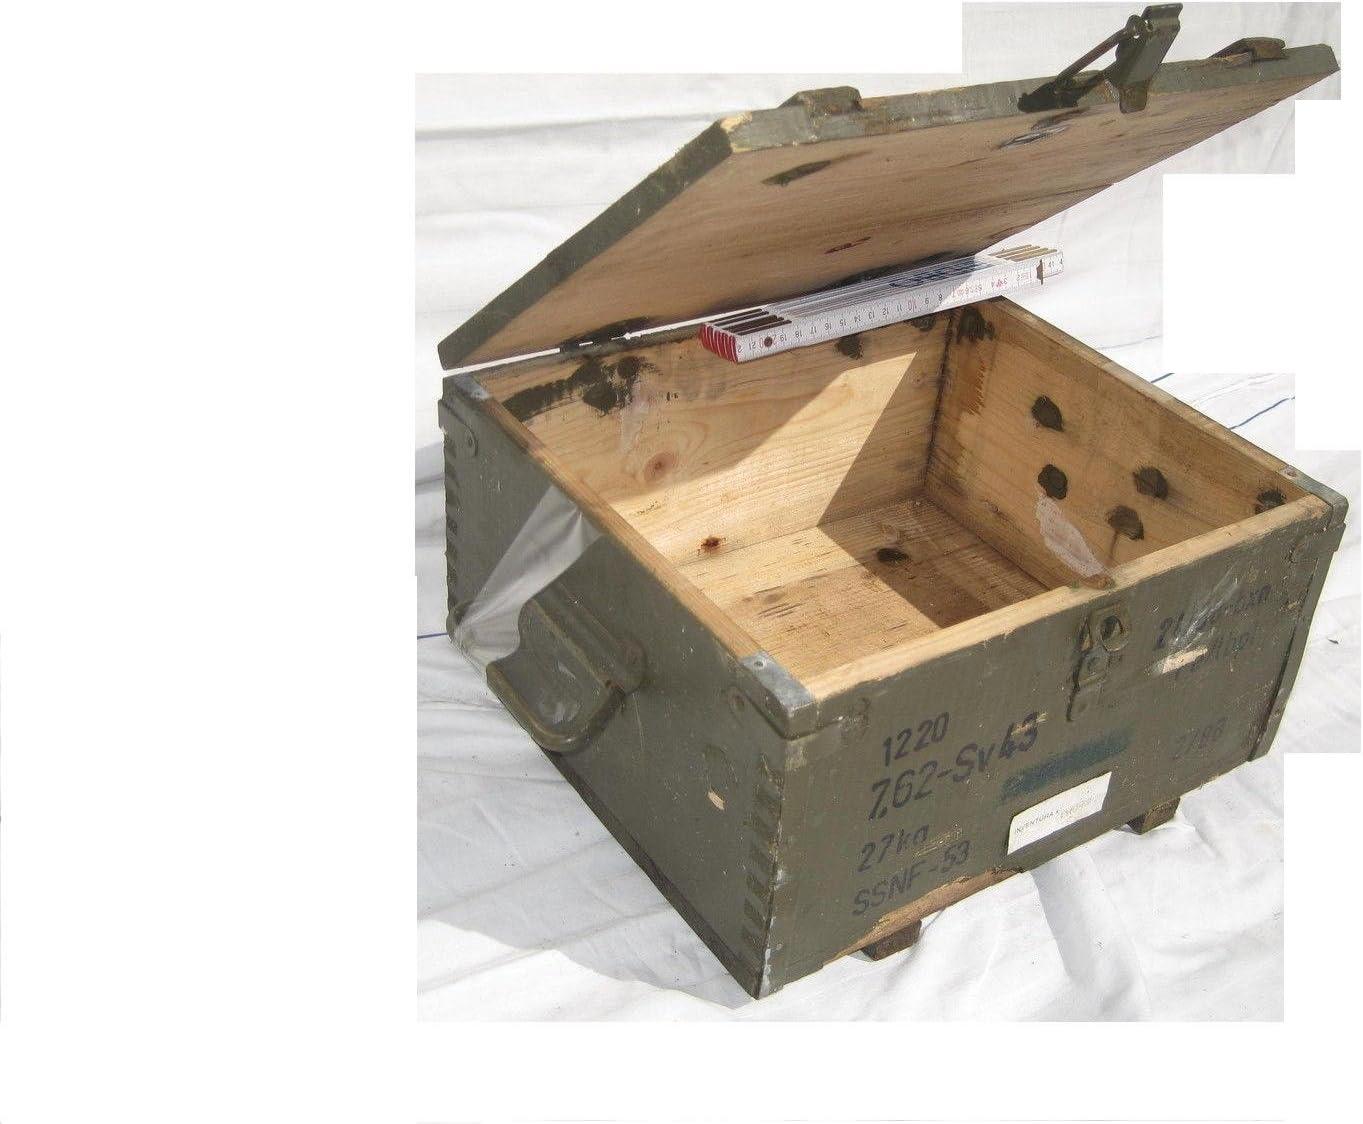 Unbekannt Caja de Madera Rusia Militar Caja para Granada de Mano Shabby Chic Vintage, Caja, Caja, 34 cm: Amazon.es: Hogar